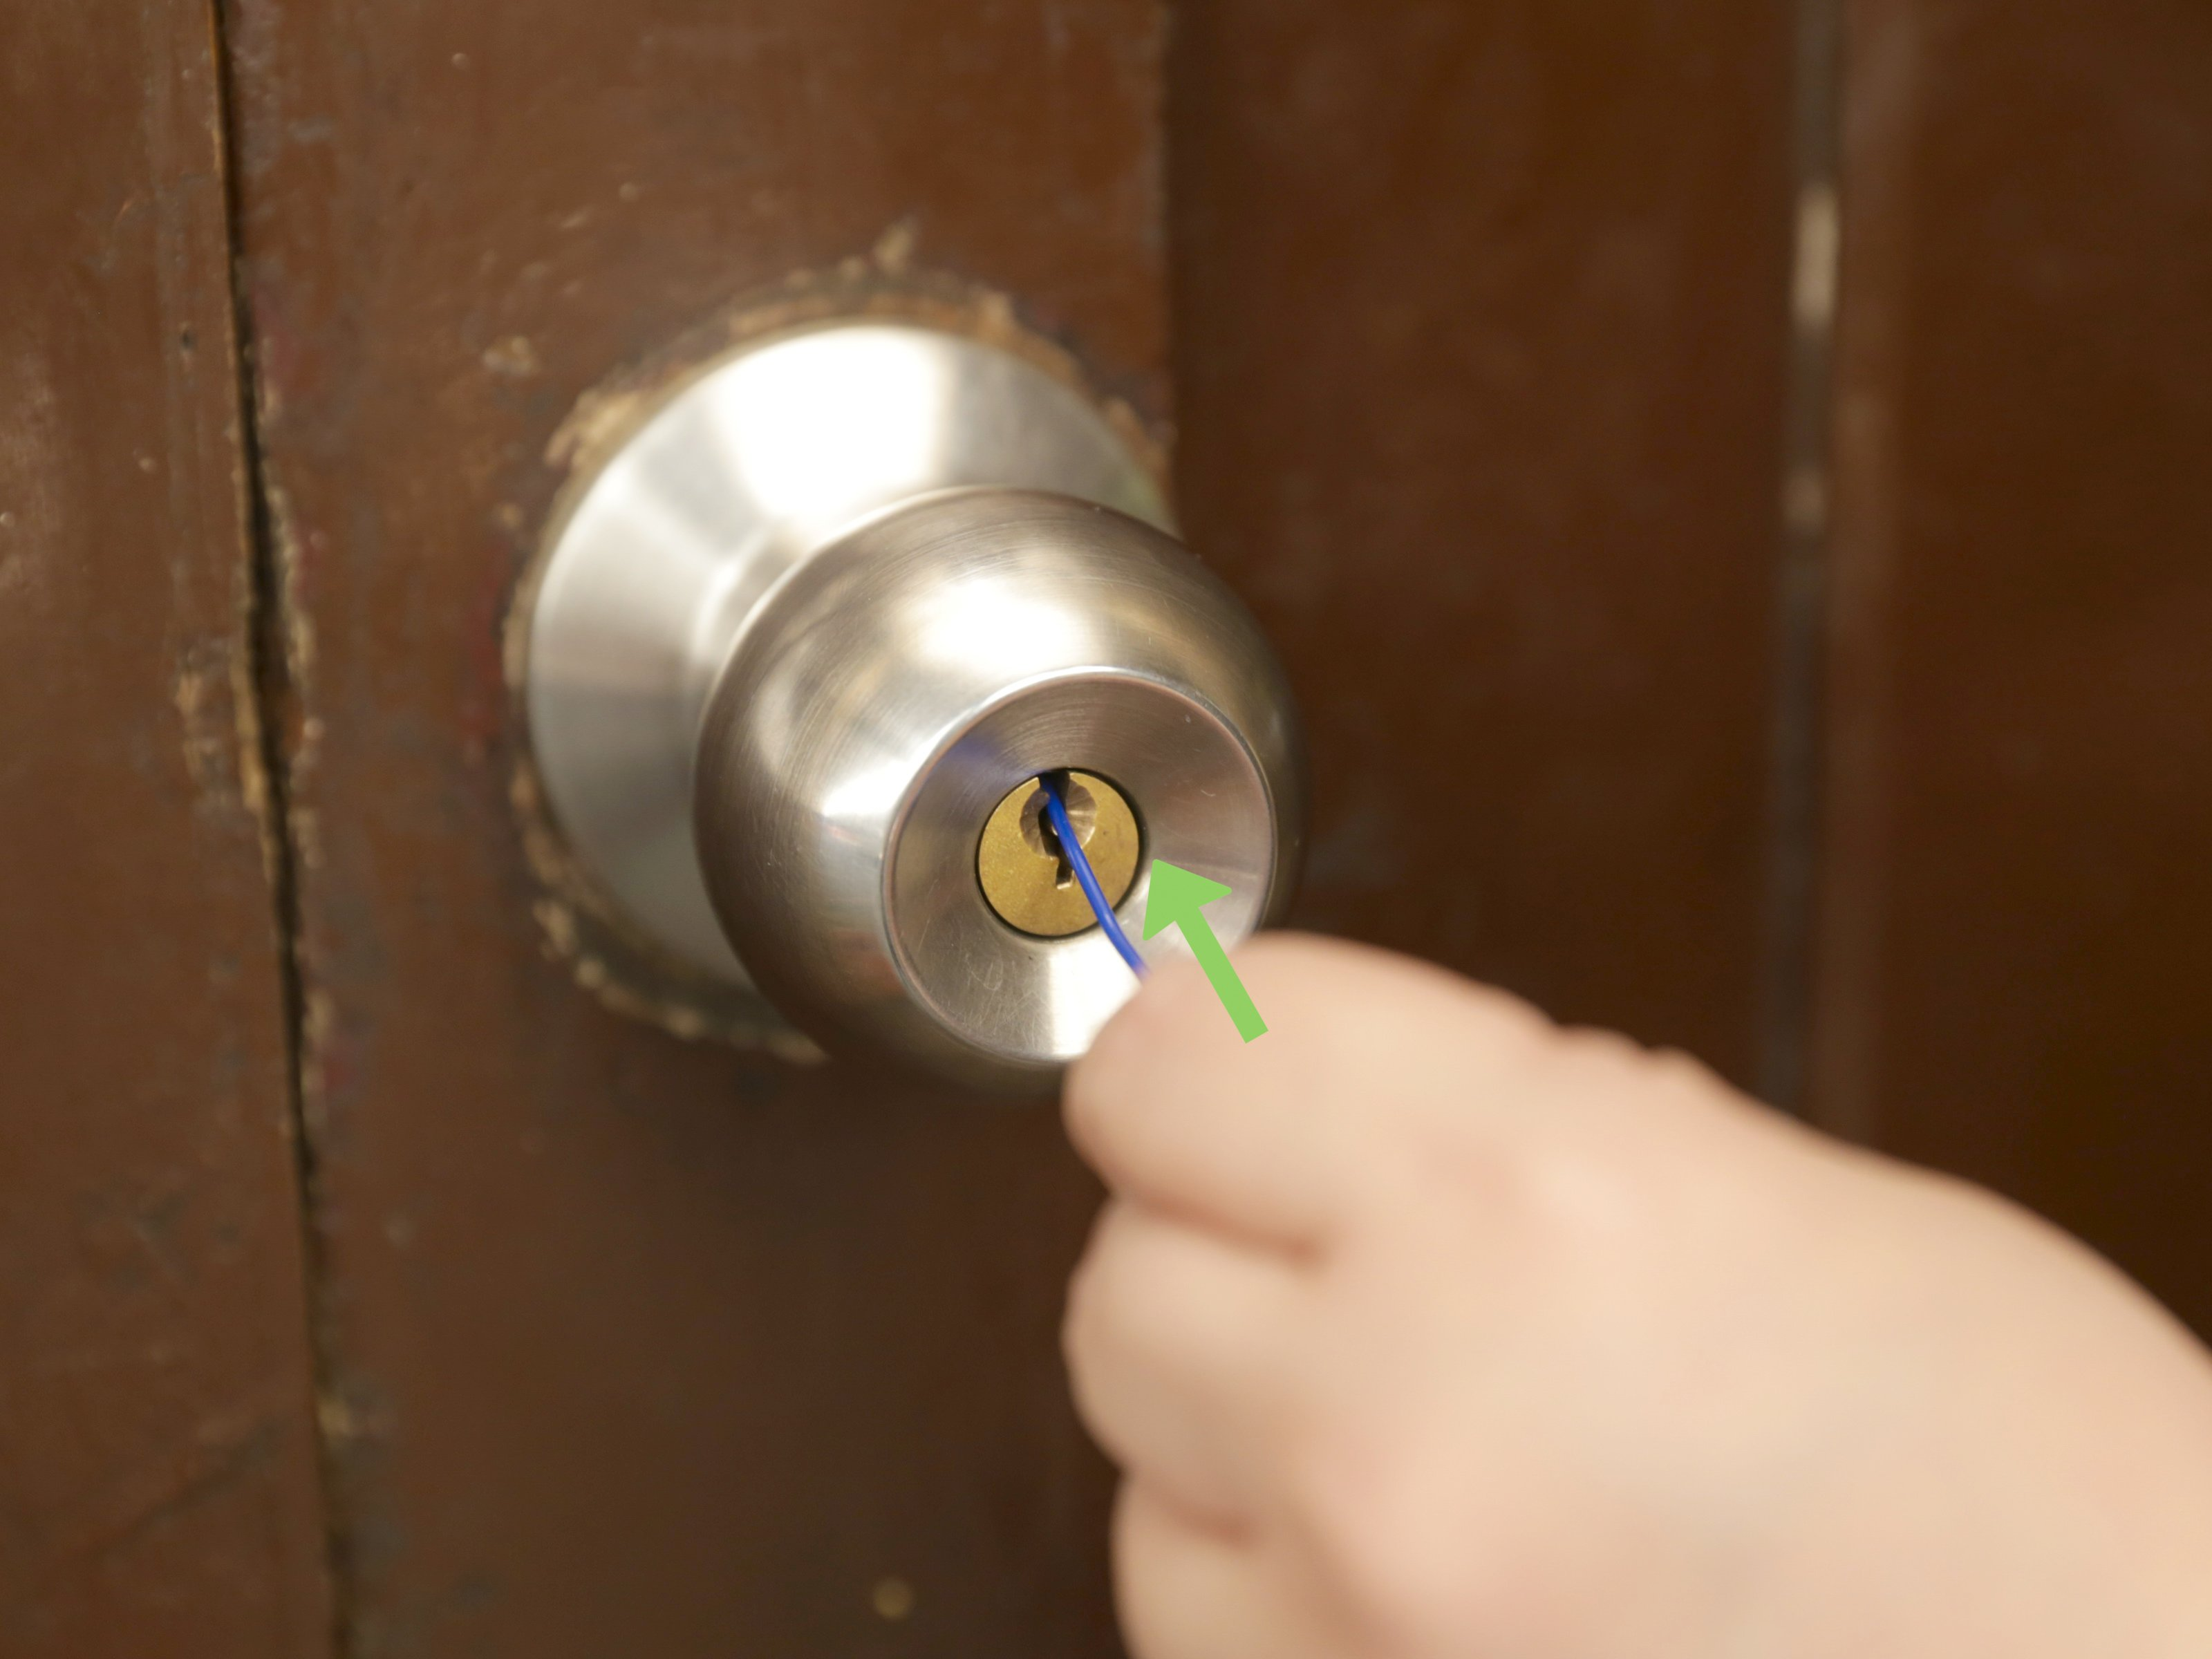 unlock door knob without key photo - 4